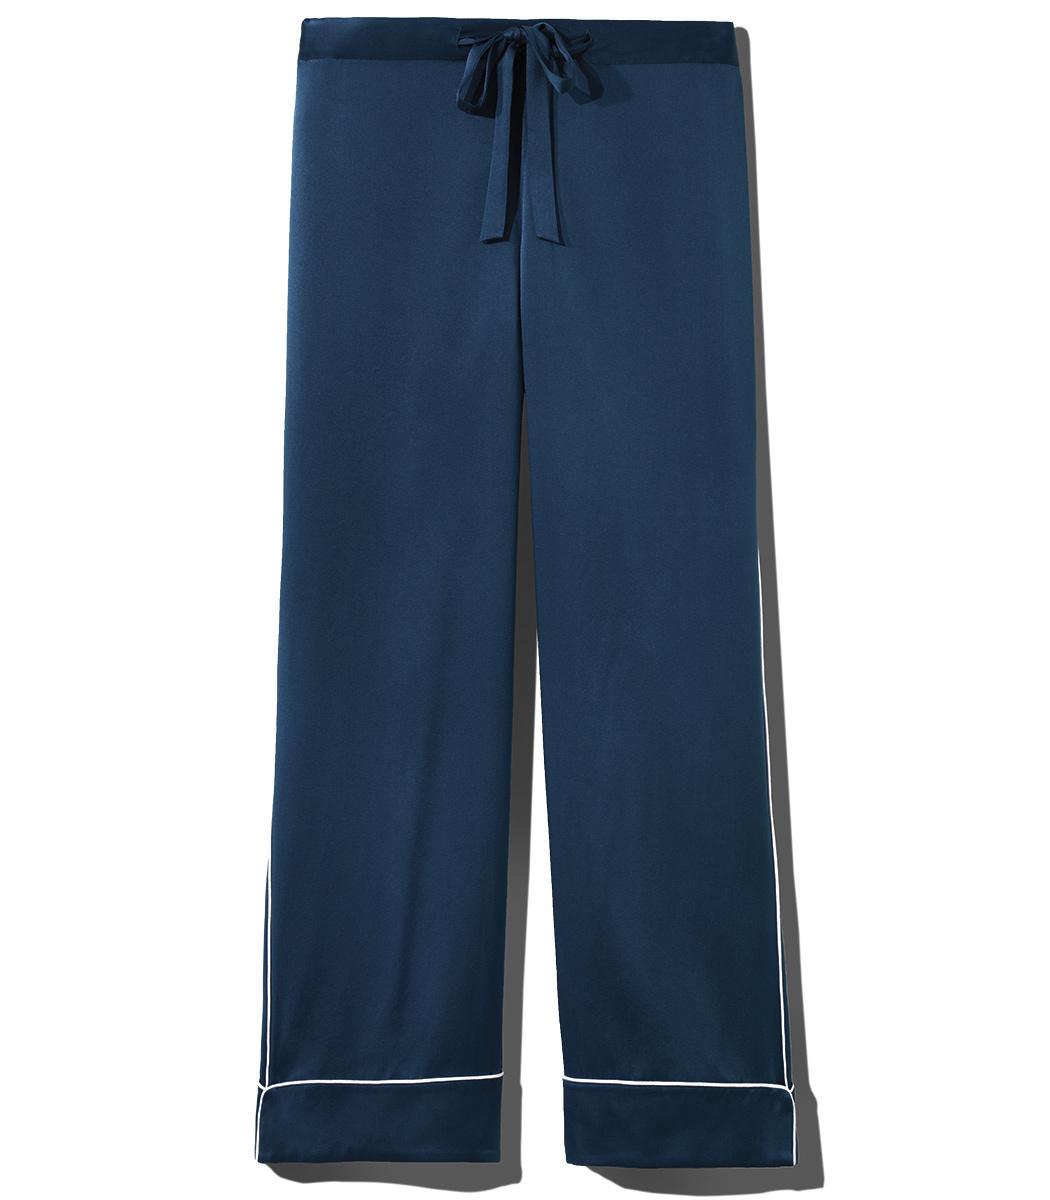 Navy Coco Pant